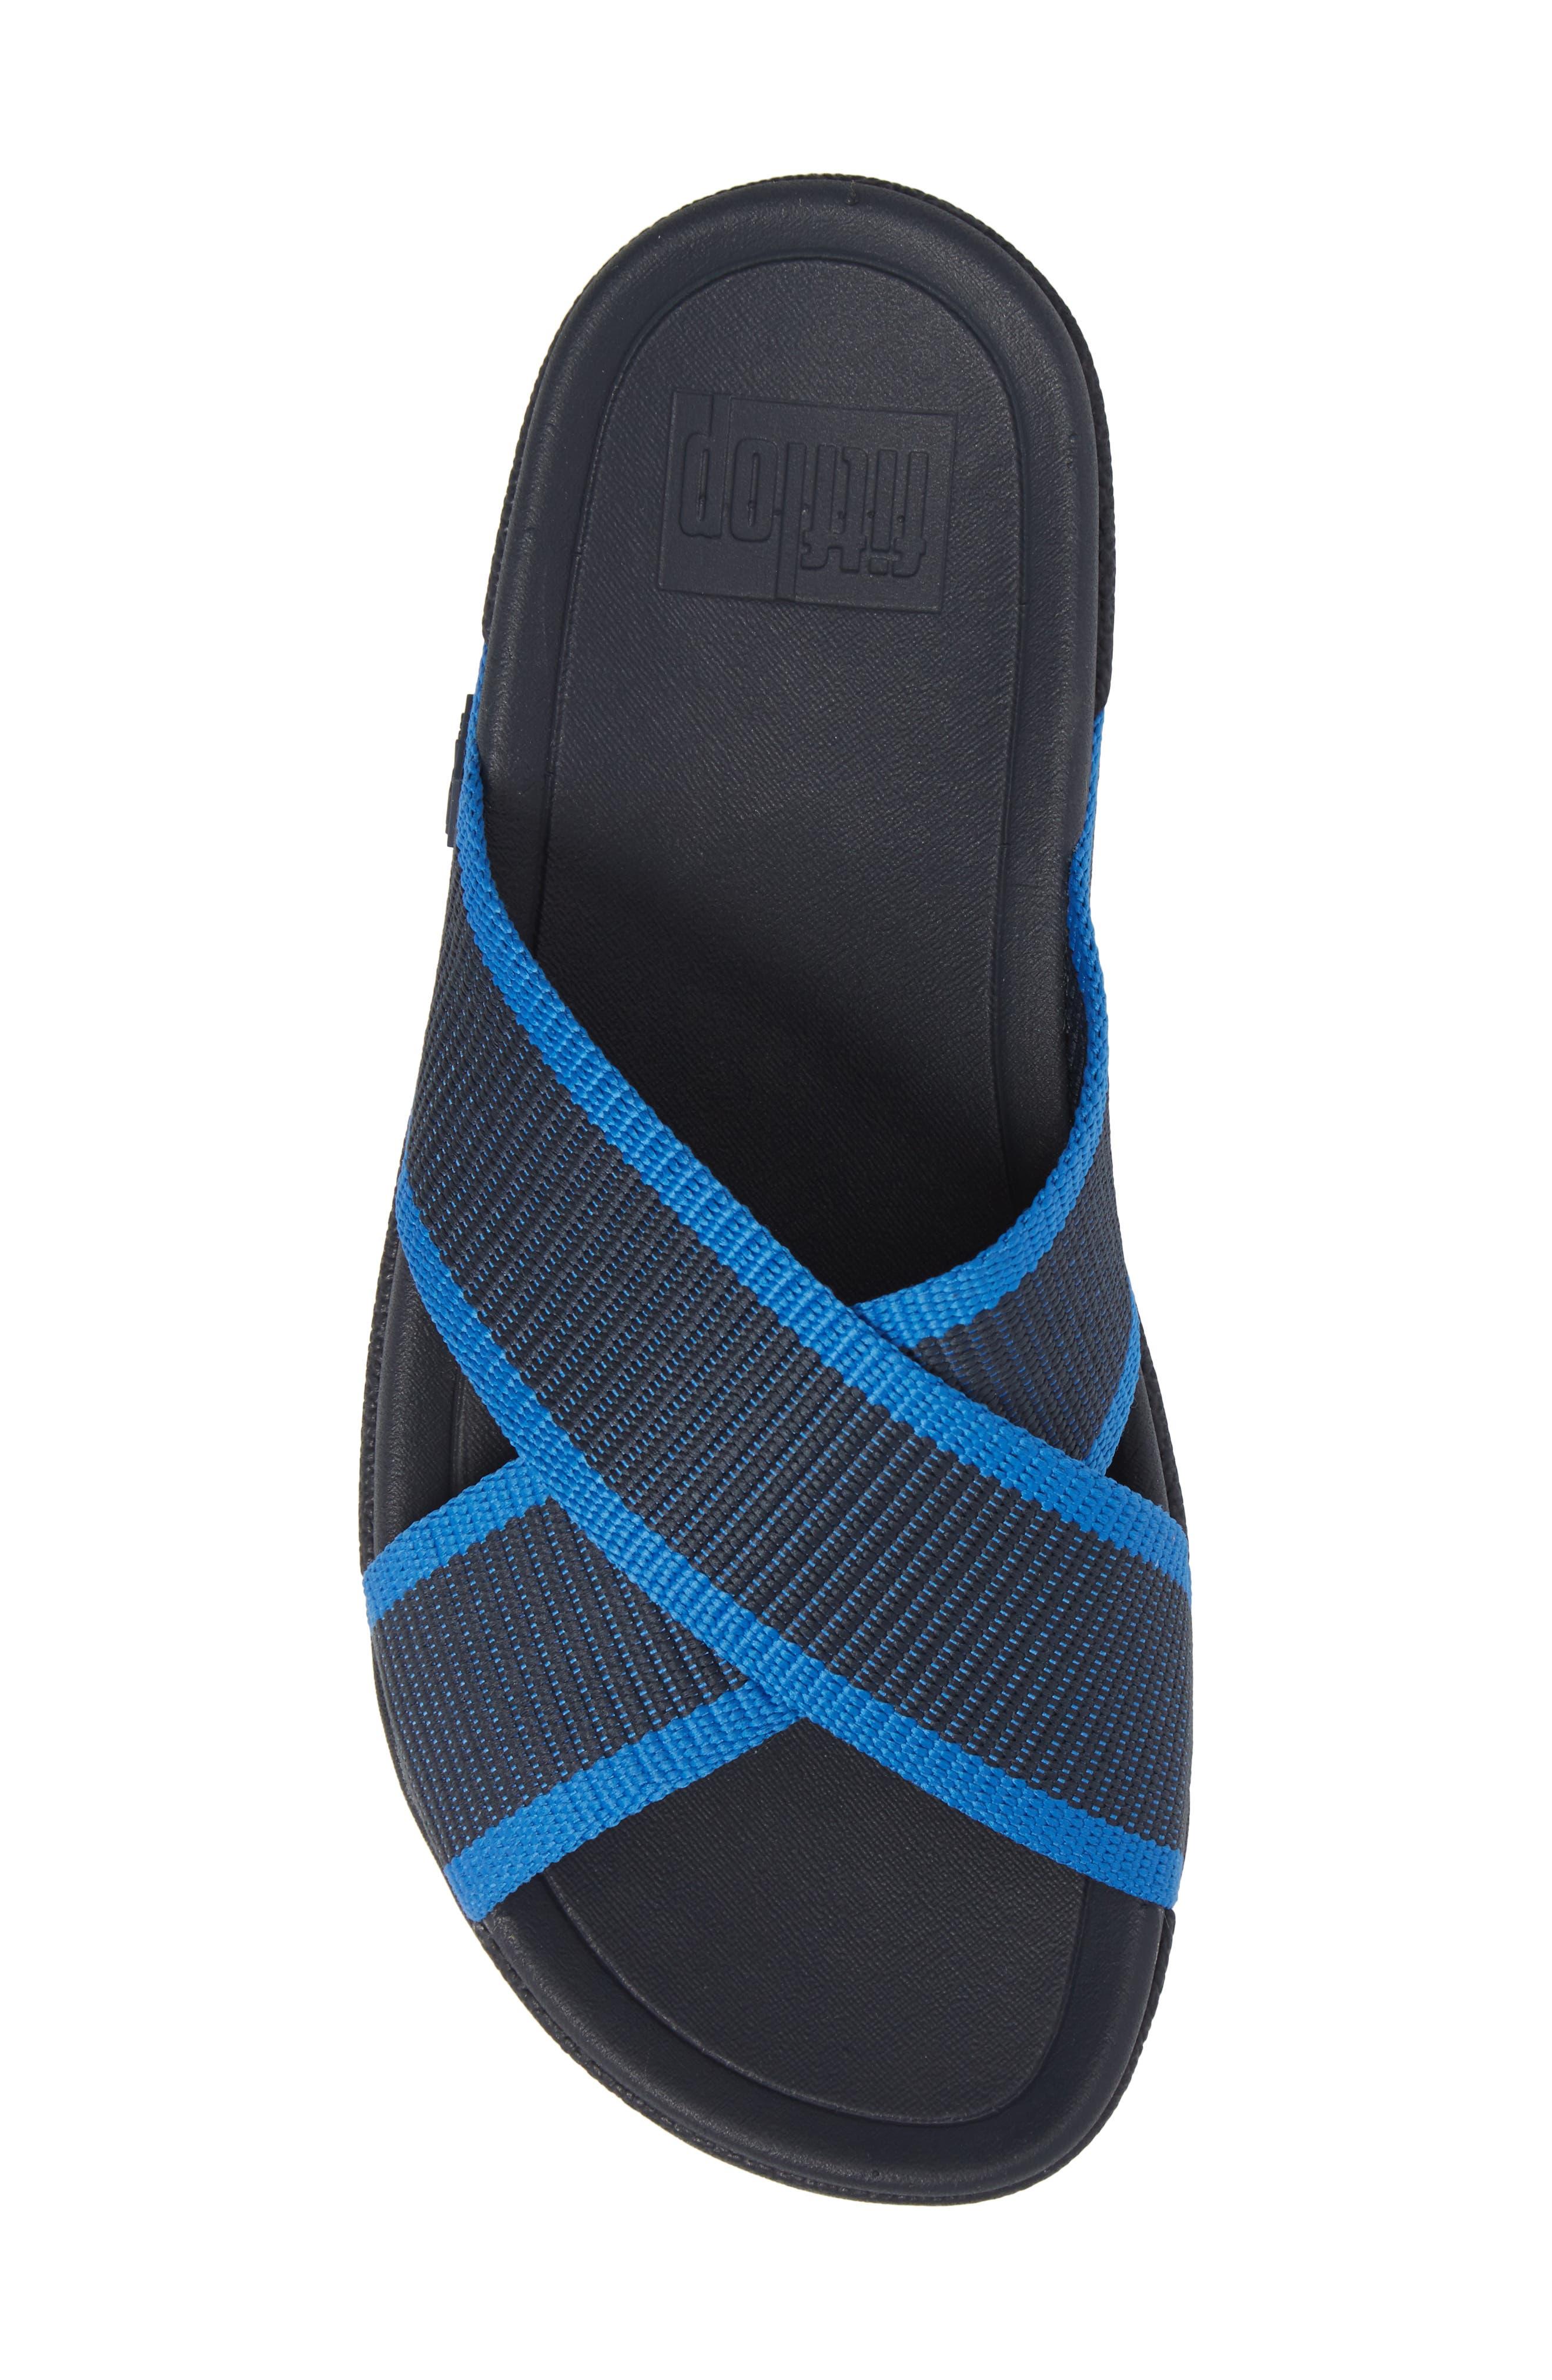 Surfer Slide Sandal,                             Alternate thumbnail 5, color,                             SUPERNAVY BLUE